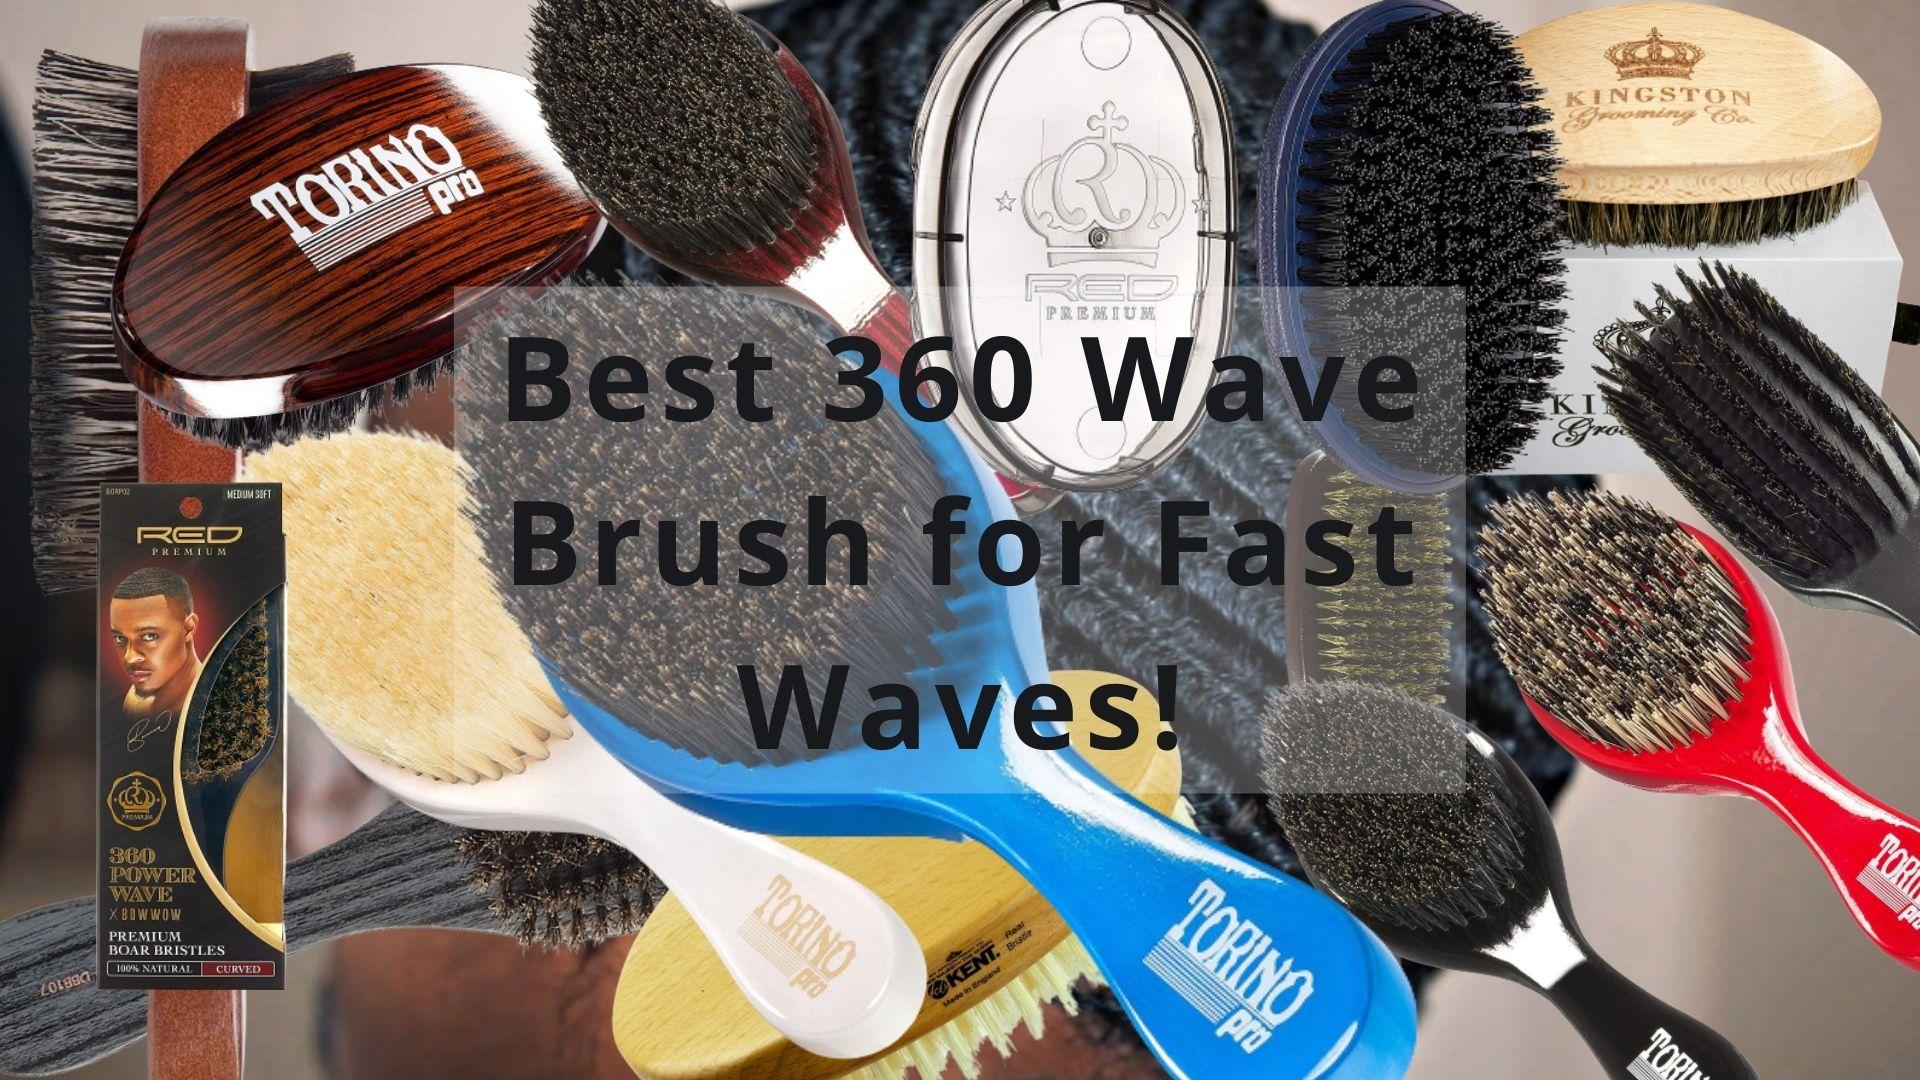 Best 360 Wave Brush